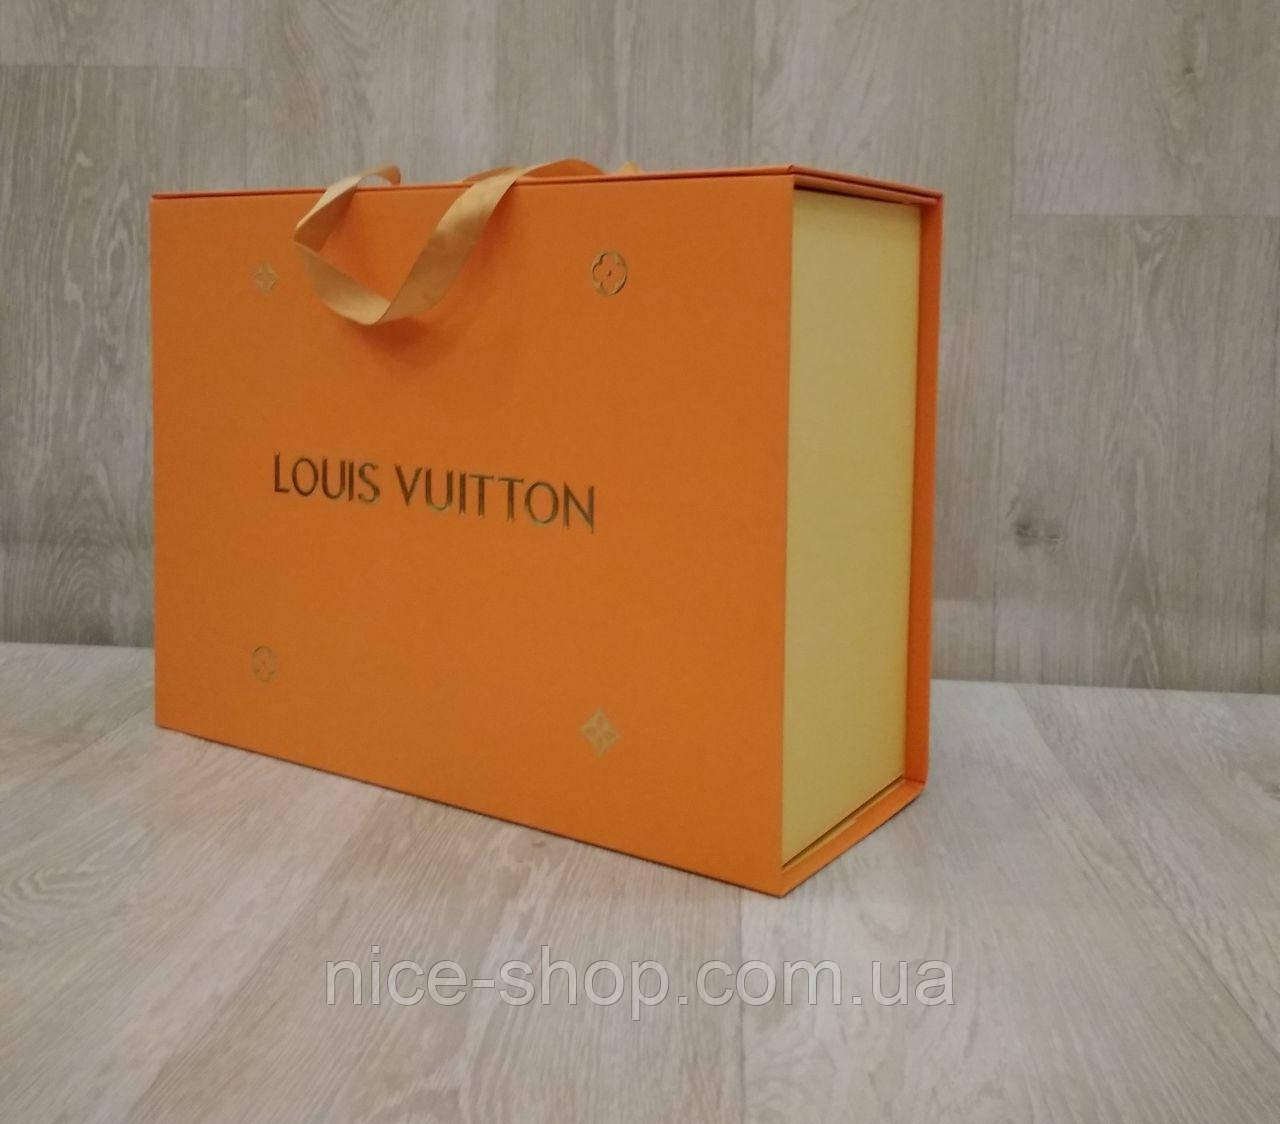 Подарочная коробка Louis Vuitton maxi, фото 1